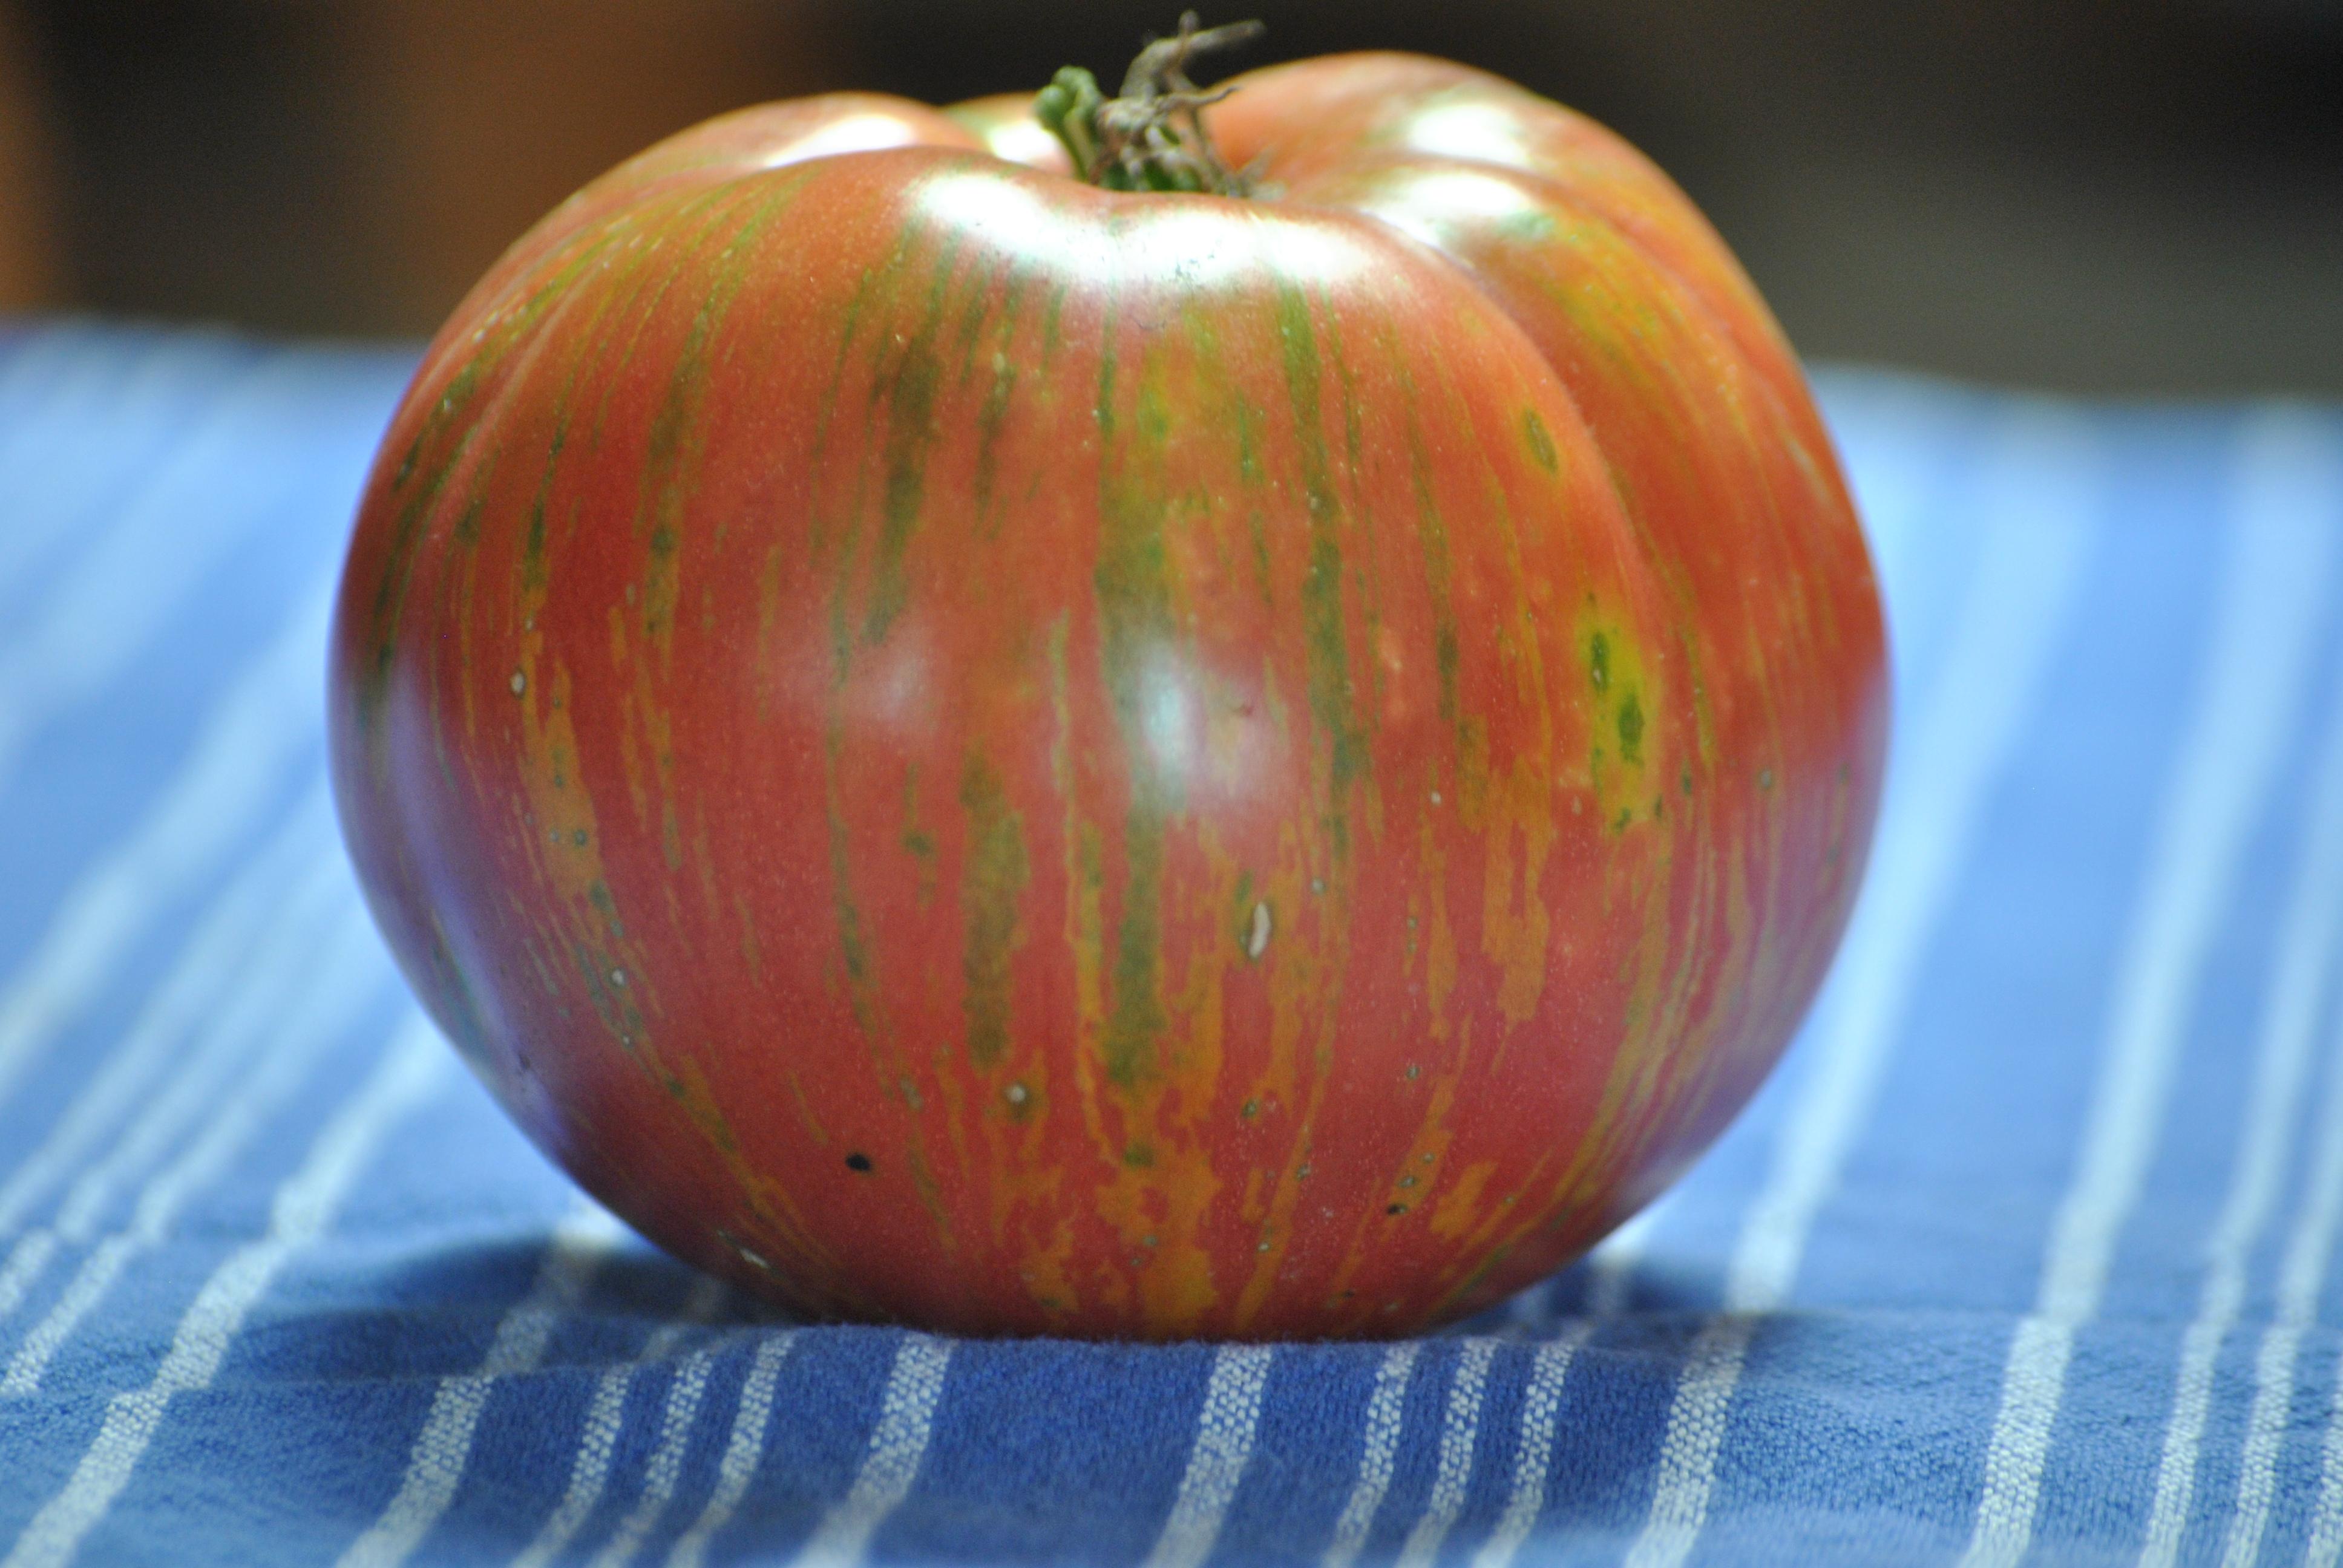 Solar Flare Wild Boar Tomatoes Whatsinyourgarden